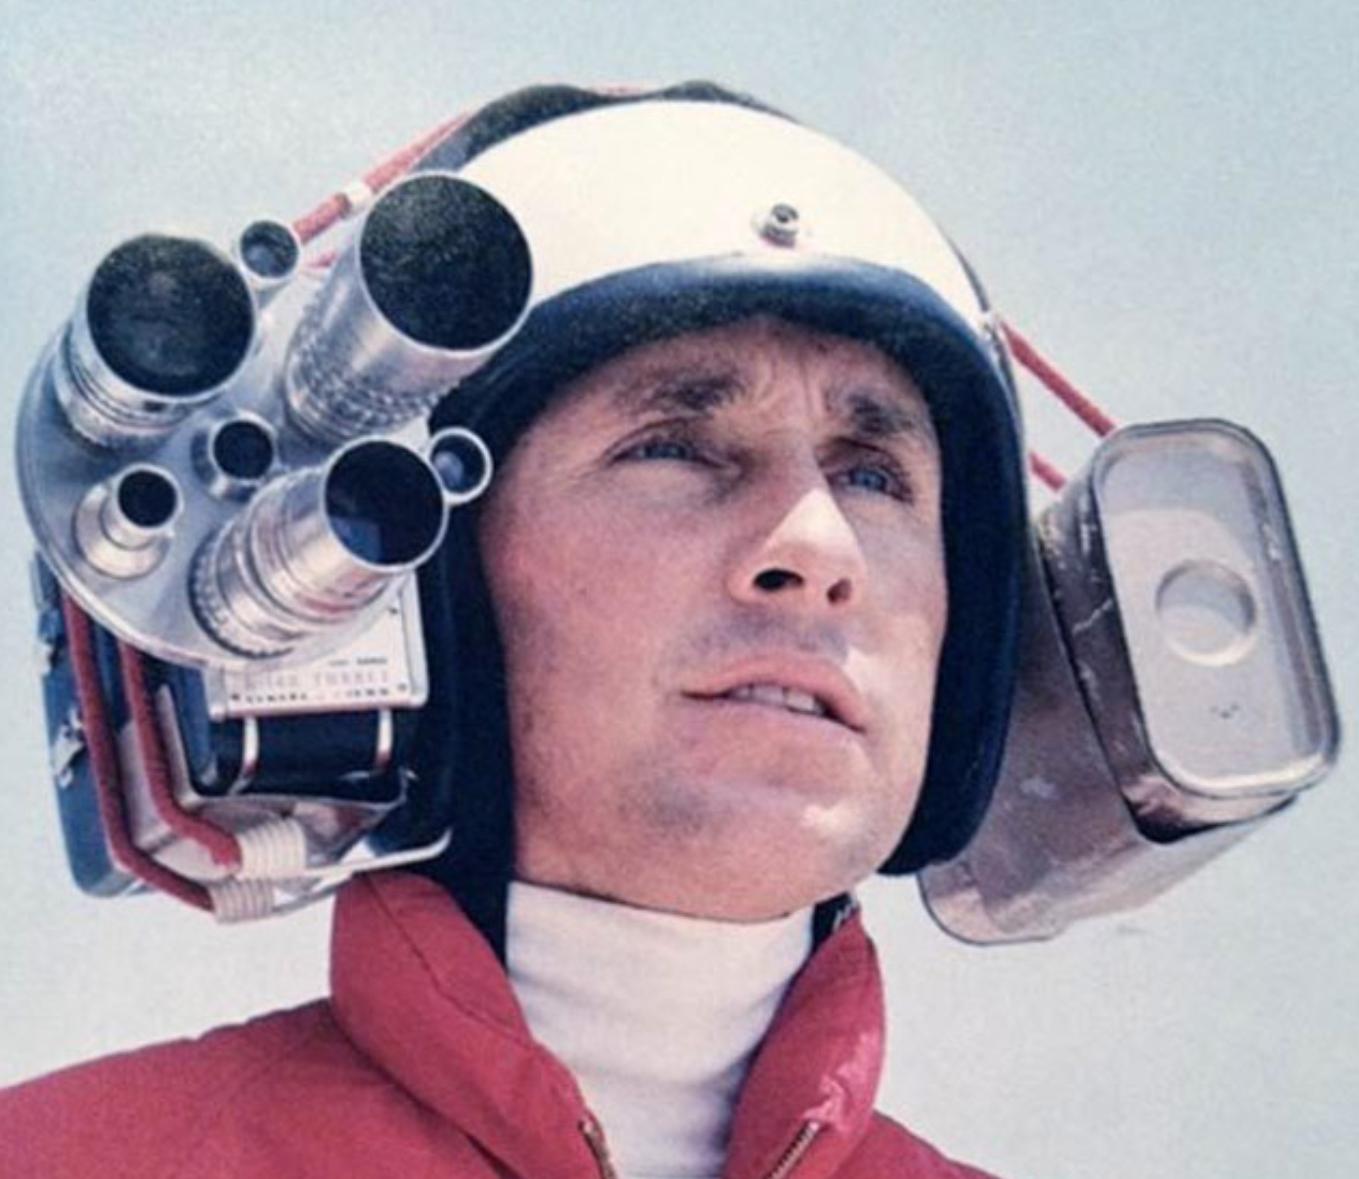 До GoPro: эволюция экшн-камер - 1